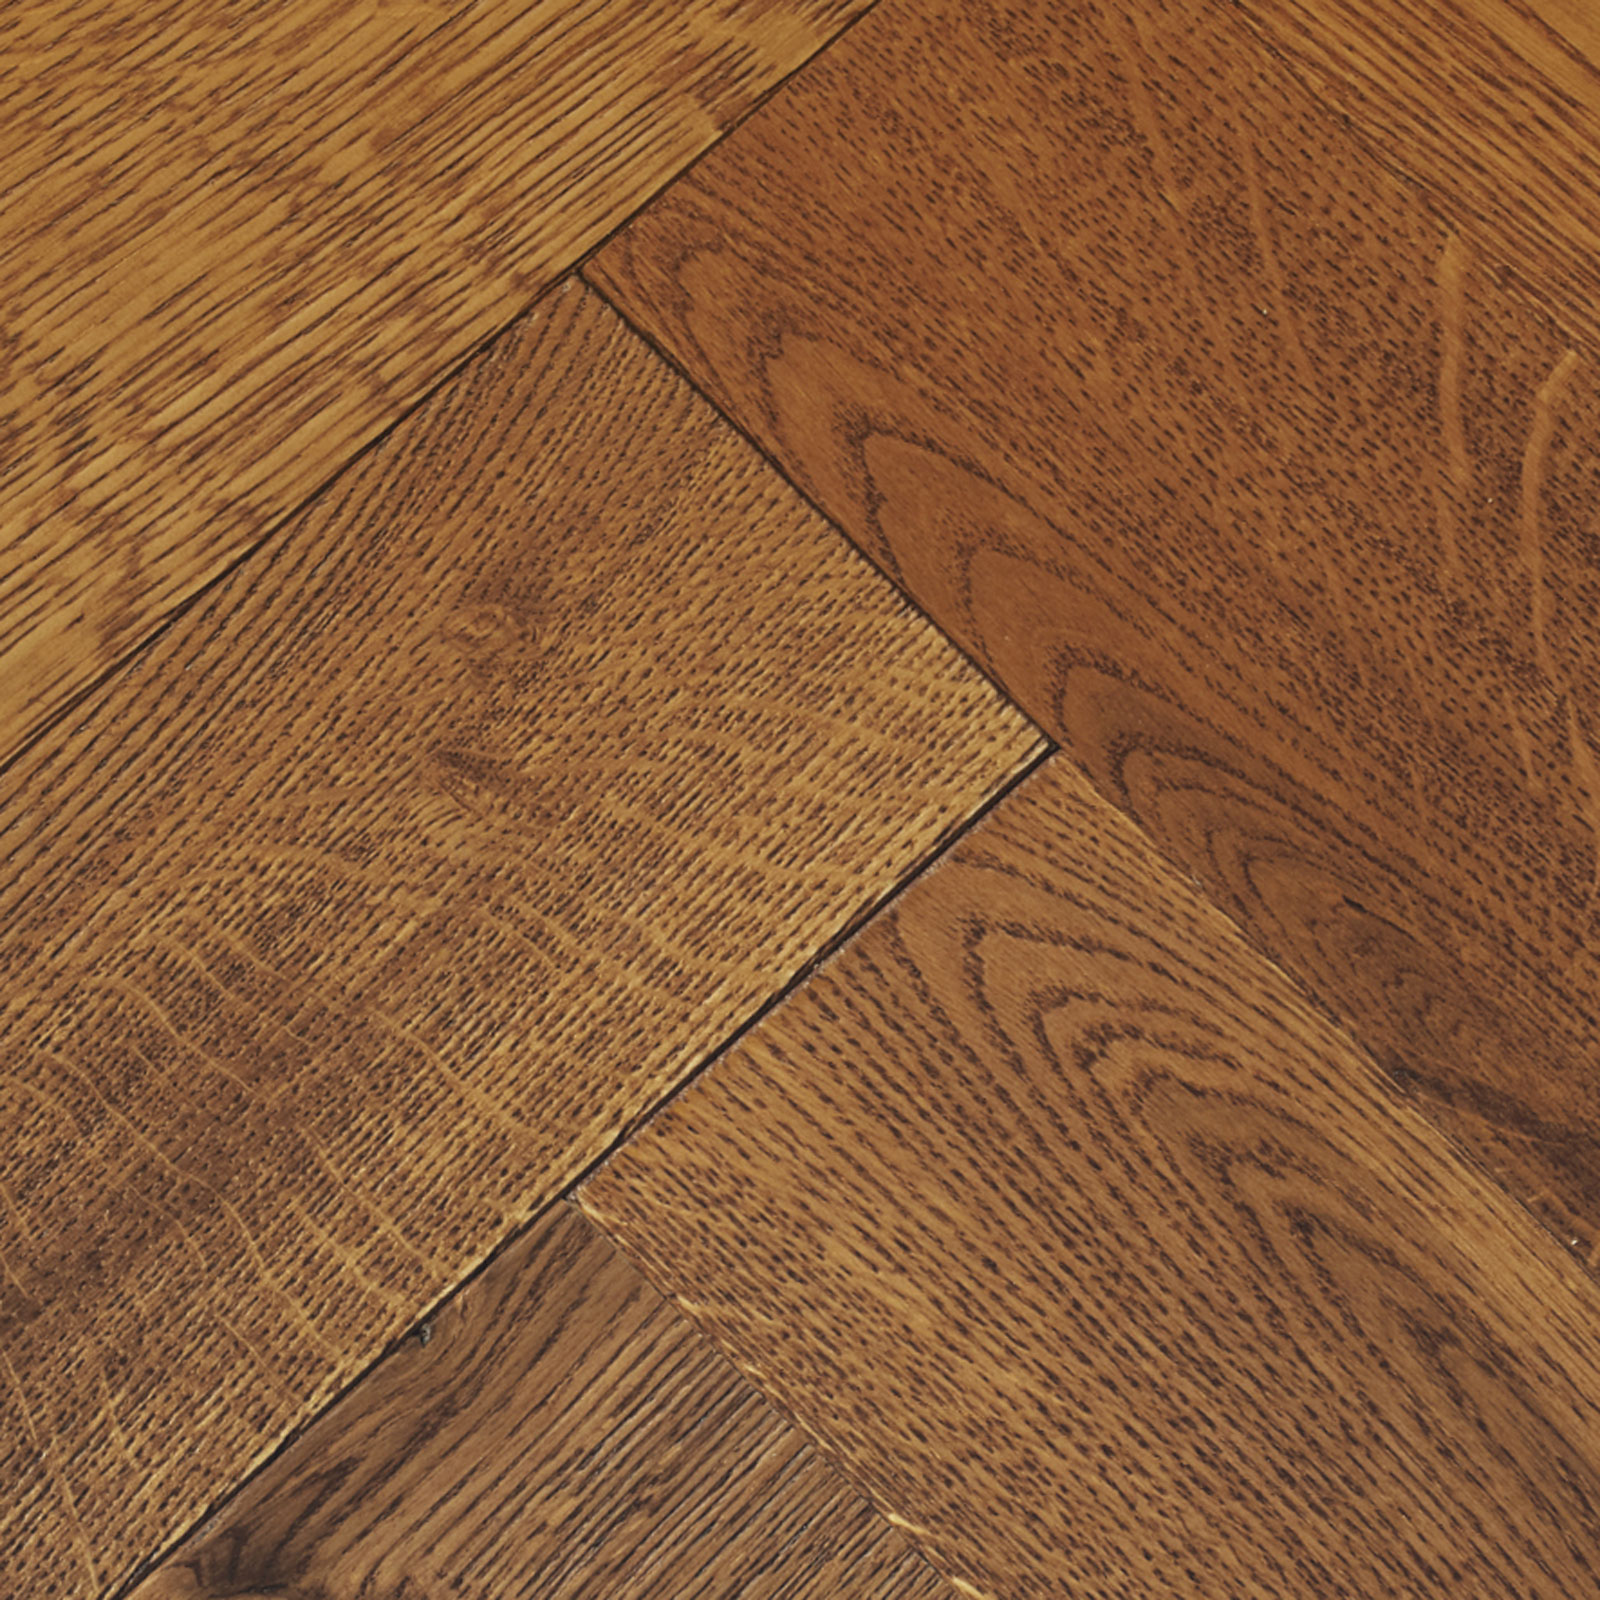 Goodrich Coffee Oak Parquet Flooring  Woodpecker Flooring